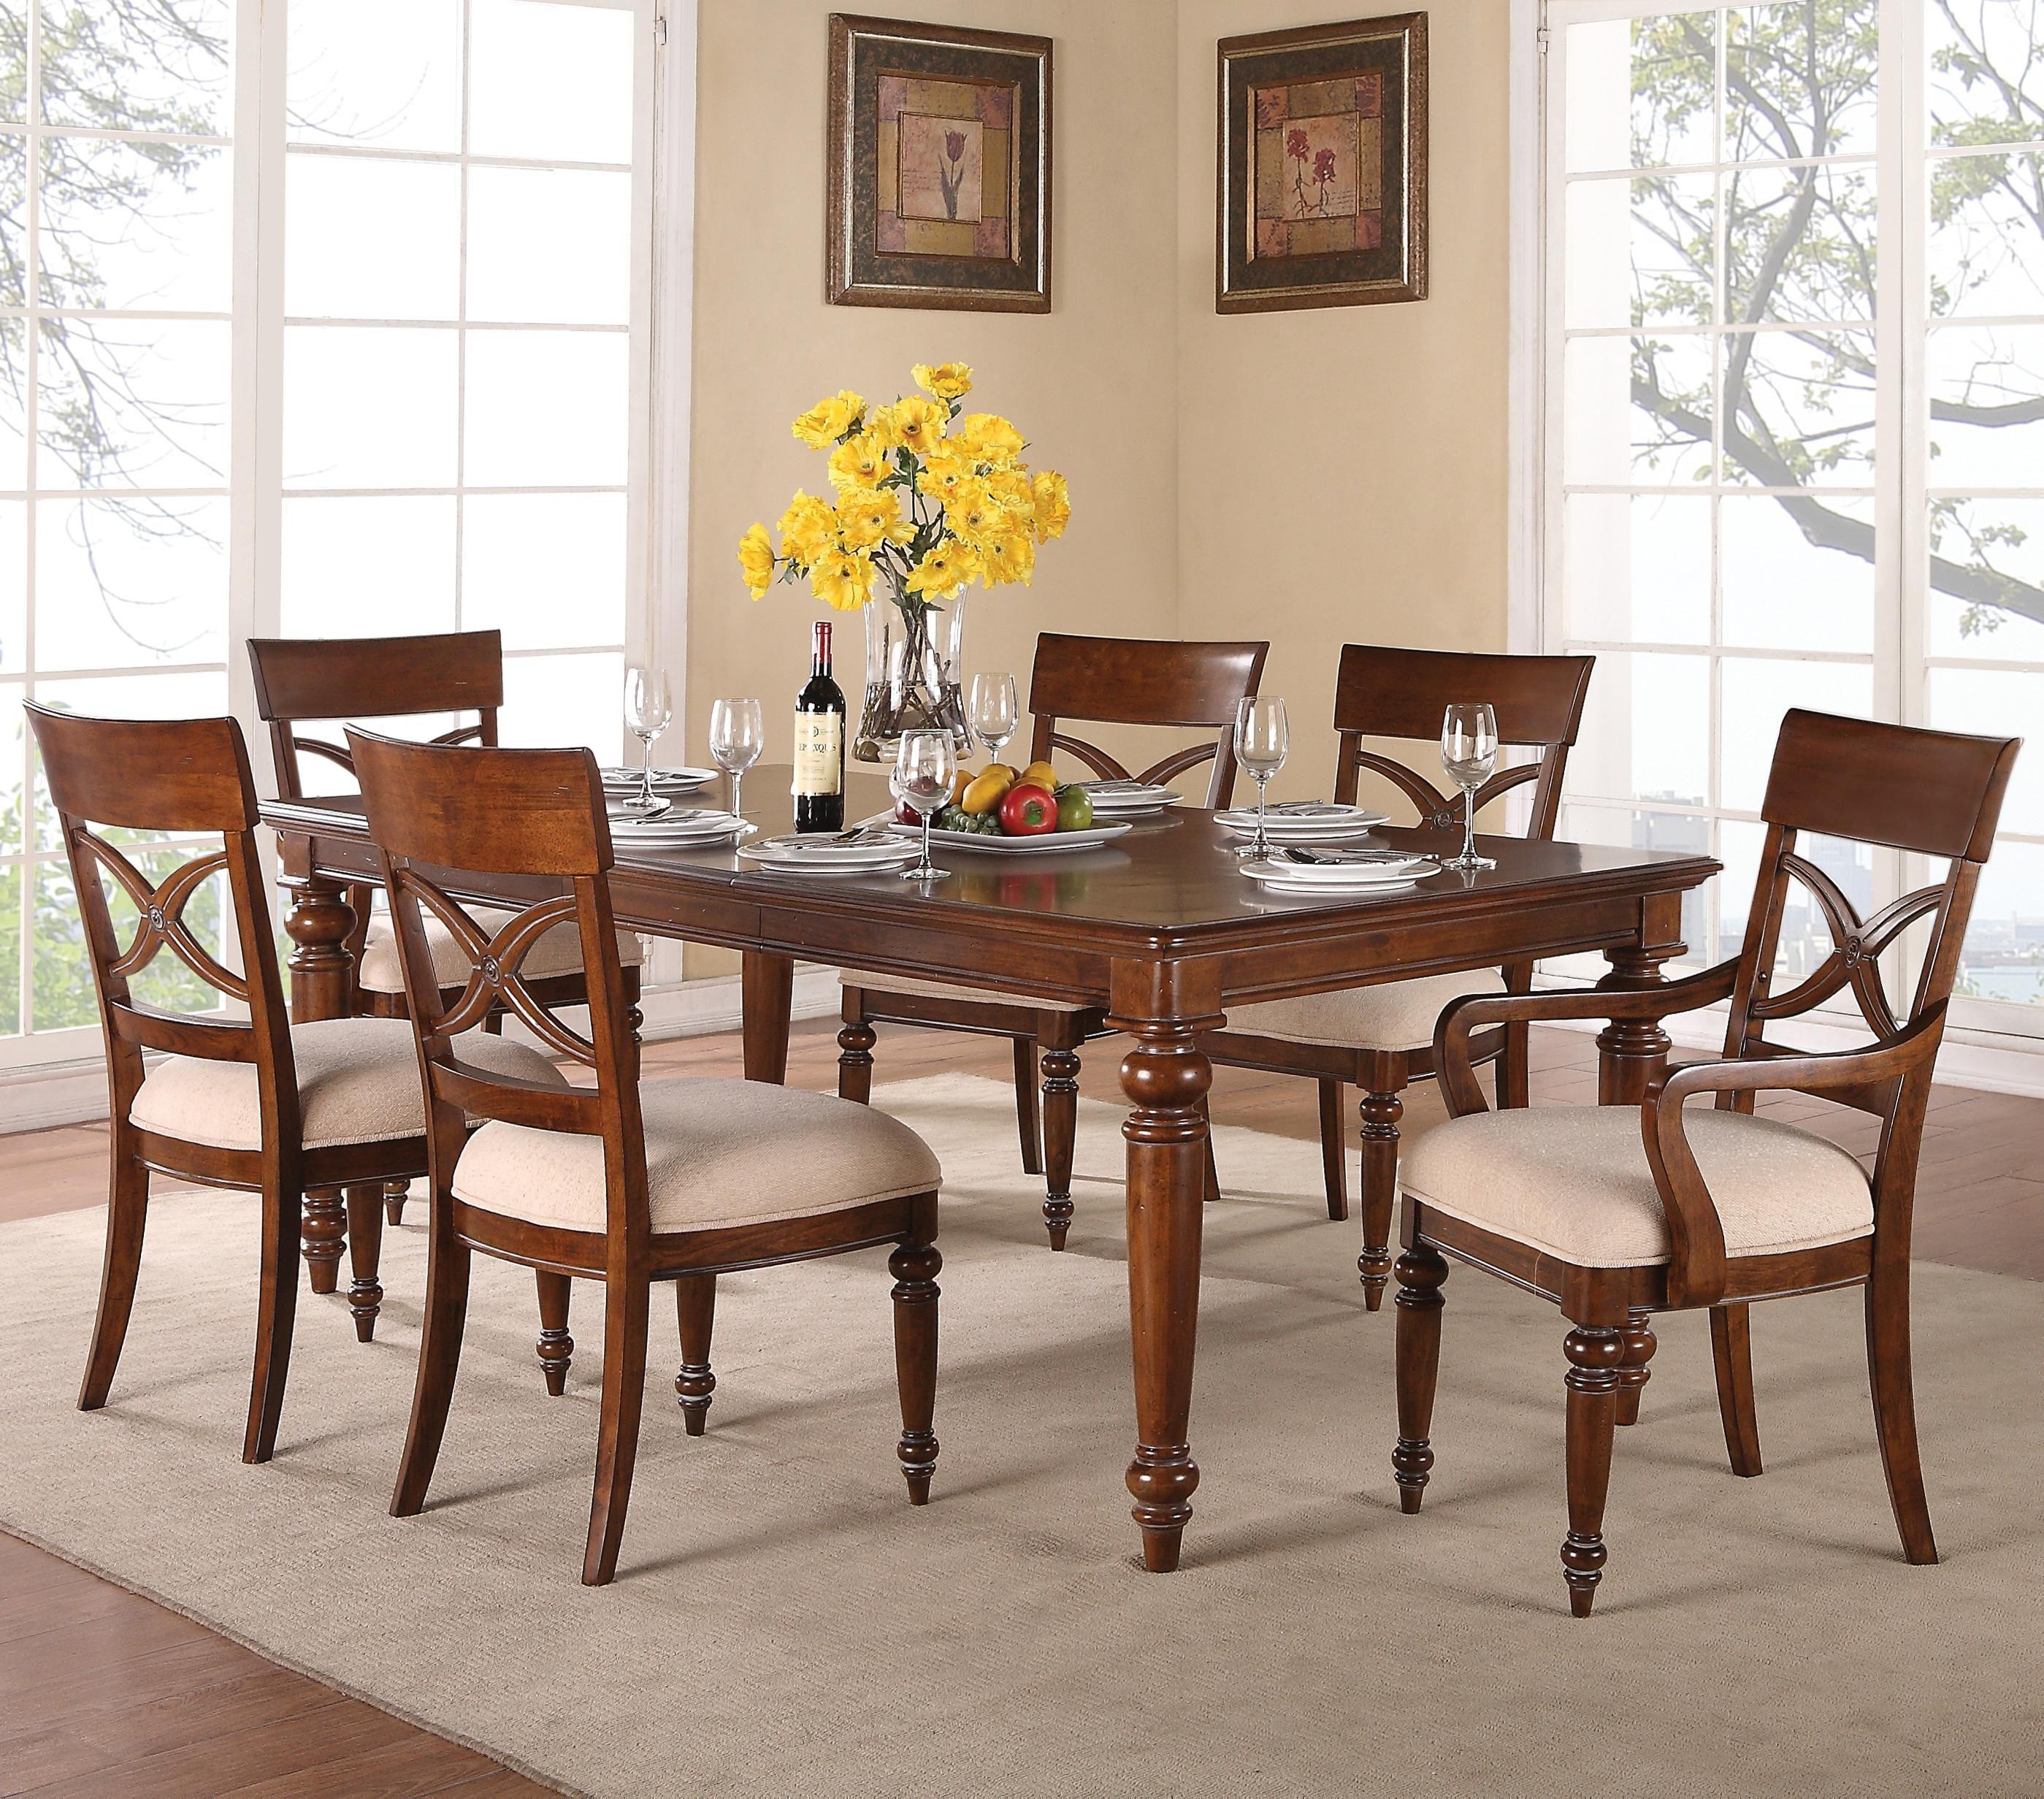 American Heritage 7 Piece Dining Setflexsteel Wynwood Captivating Heritage Dining Room Furniture Review